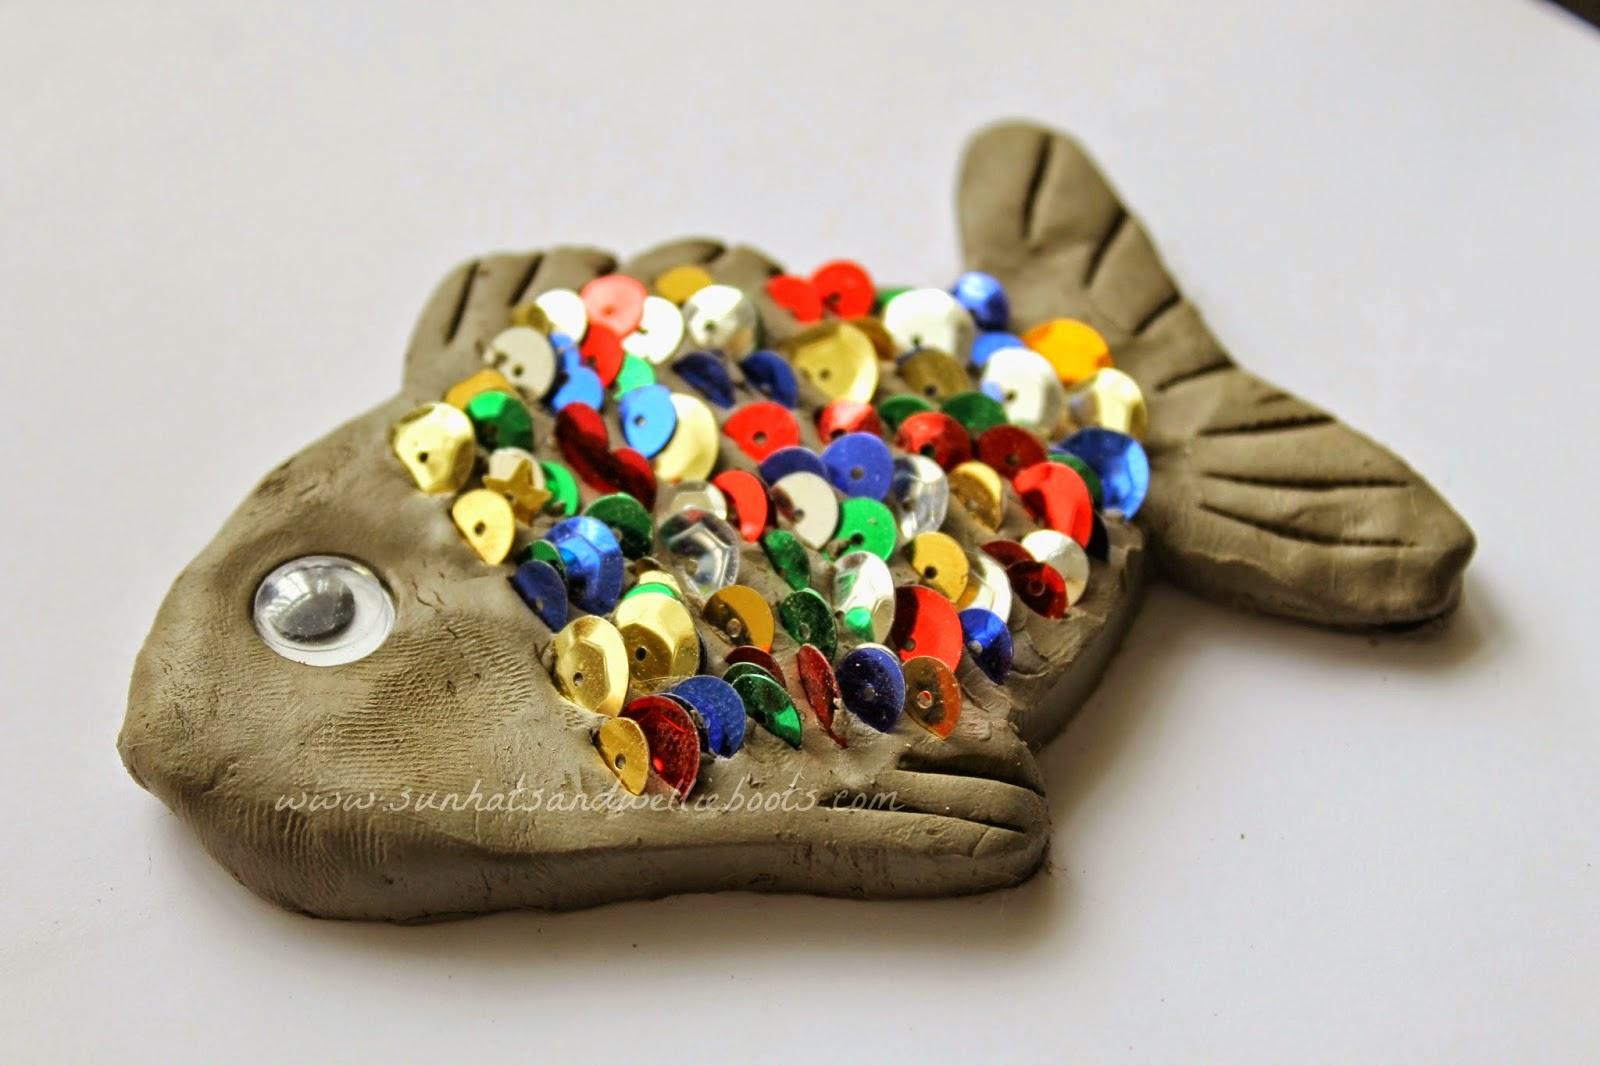 Rainbow Fish Theme Sensory Fishing Activity And Craft For Preschoolers